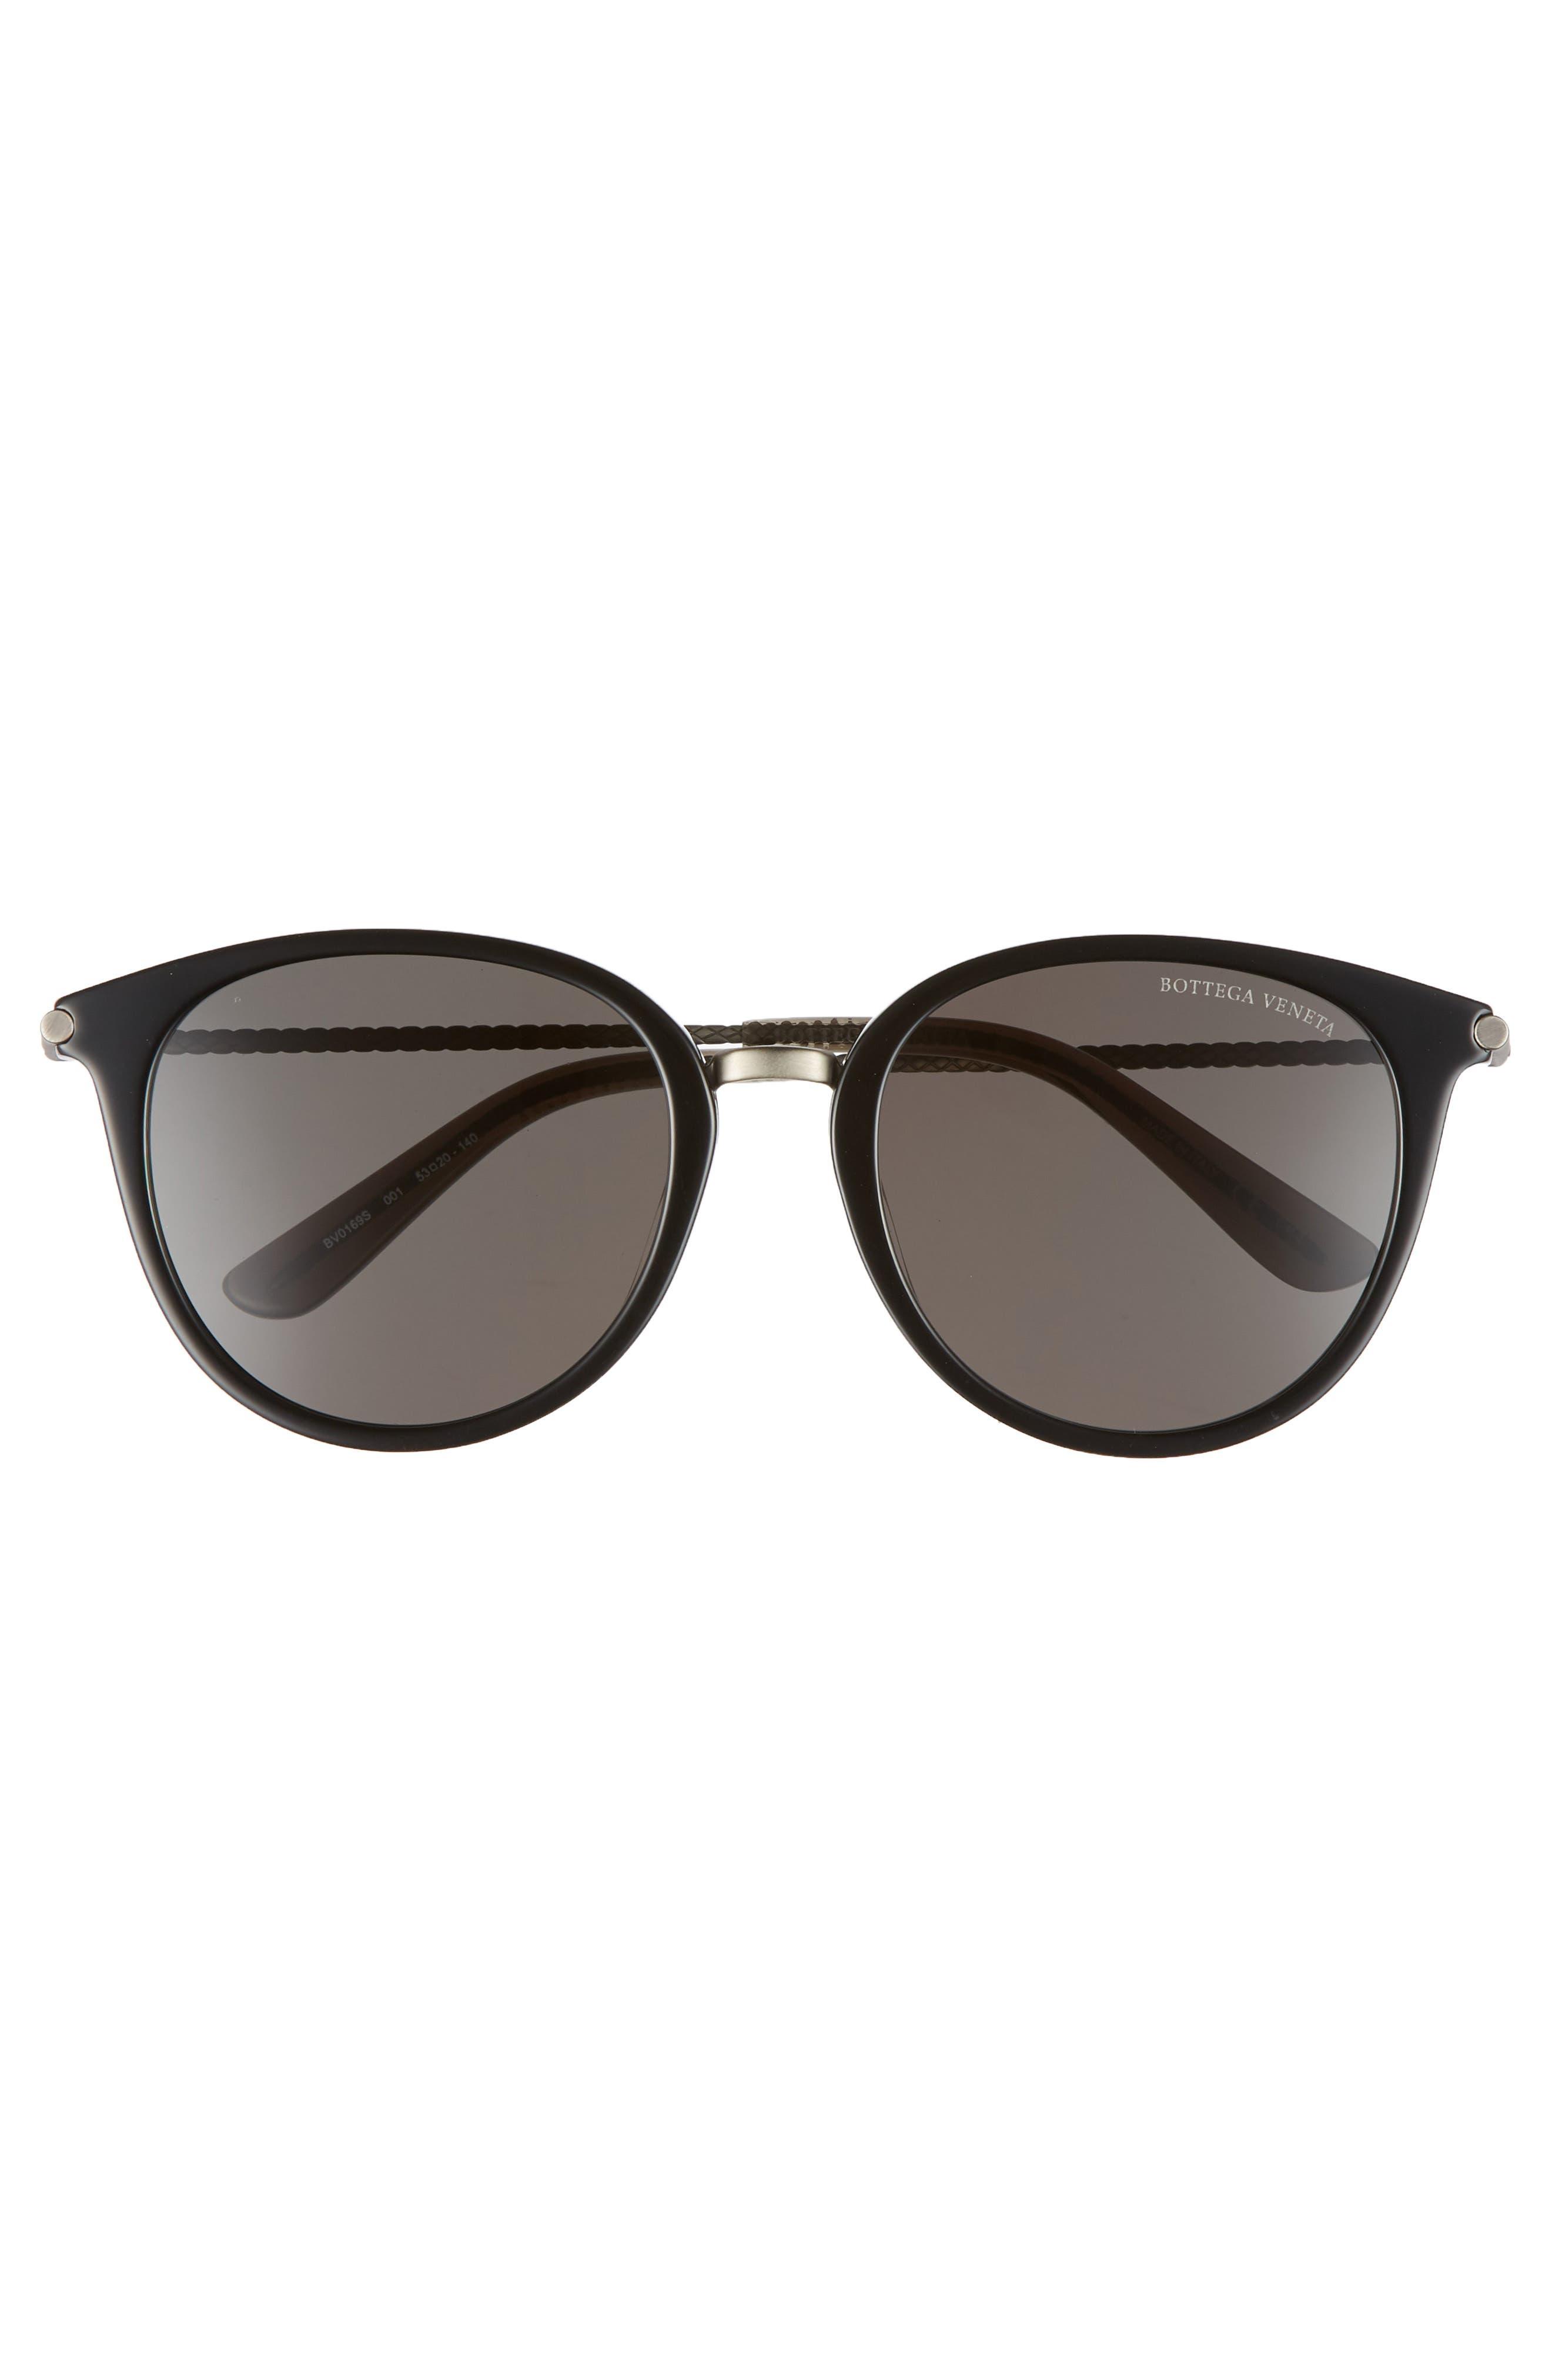 53mm Sunglasses,                             Alternate thumbnail 3, color,                             GREY/ SILVER